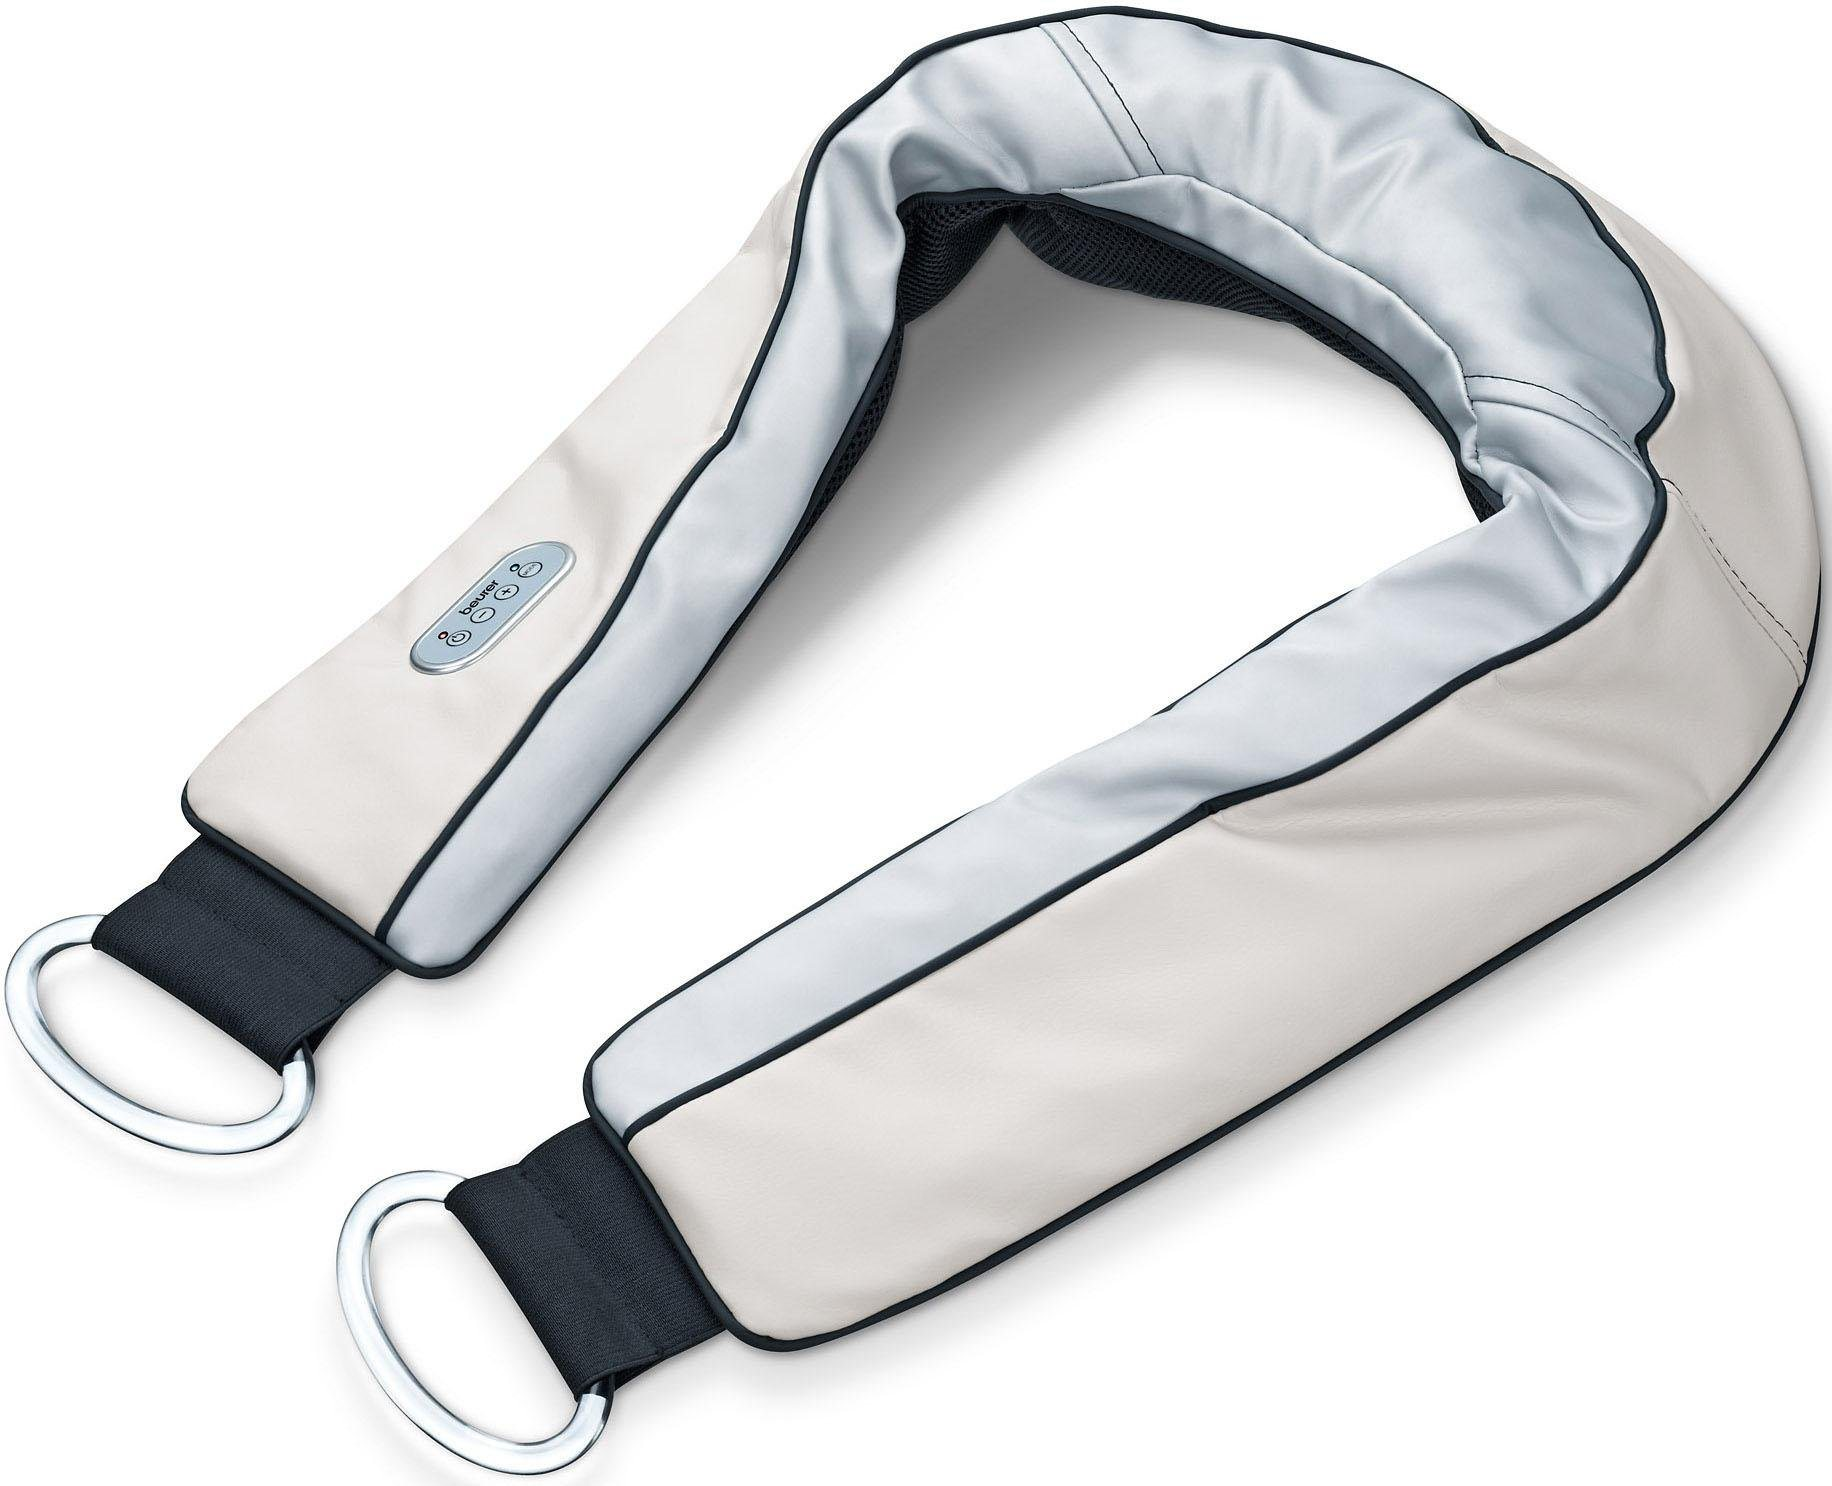 Nacken-Massagegerät MG 150